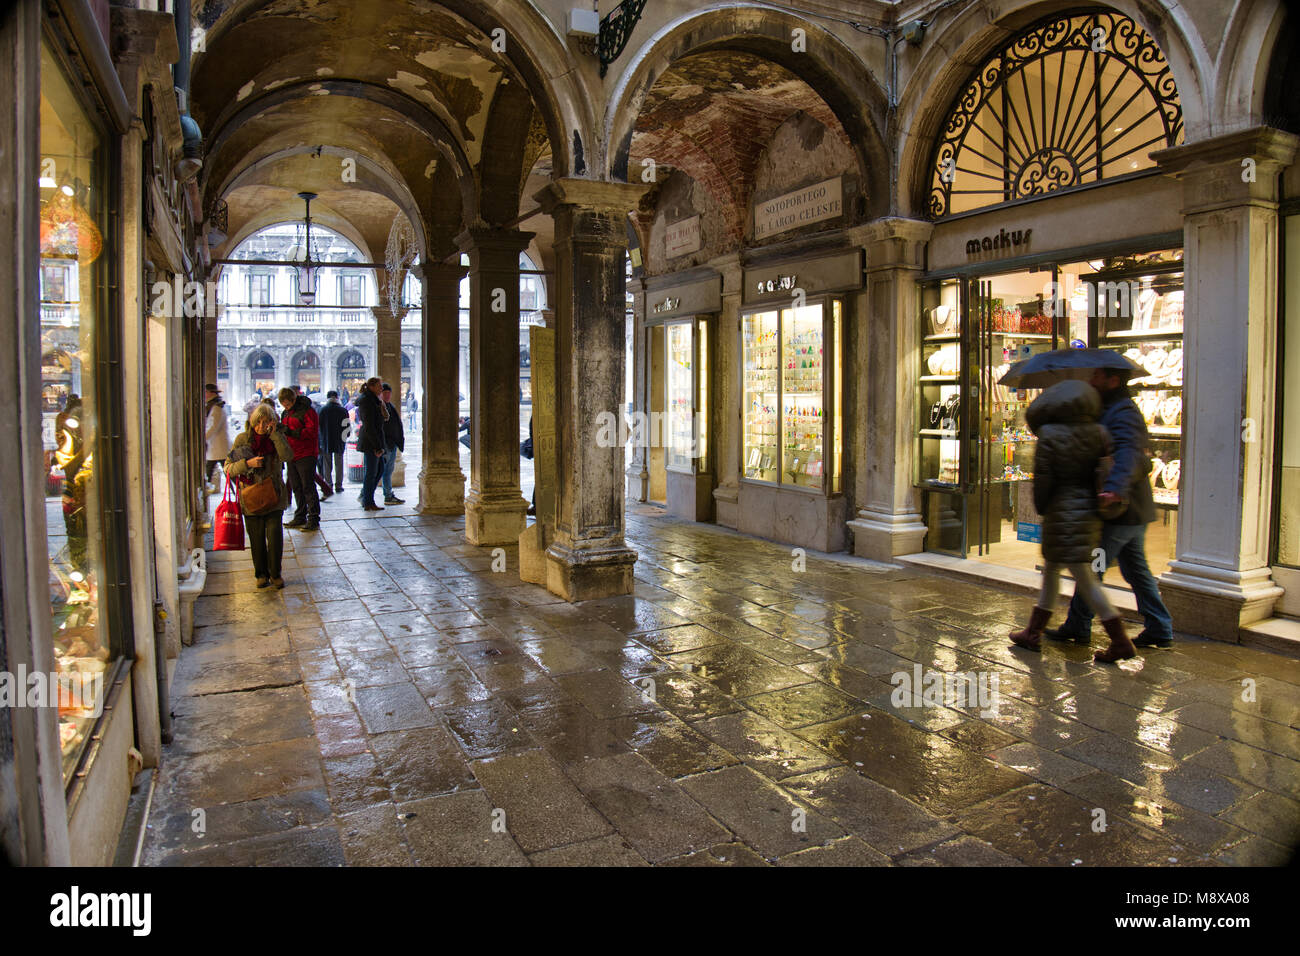 Venetian arcade on a wet day,Venice, Italy. - Stock Image